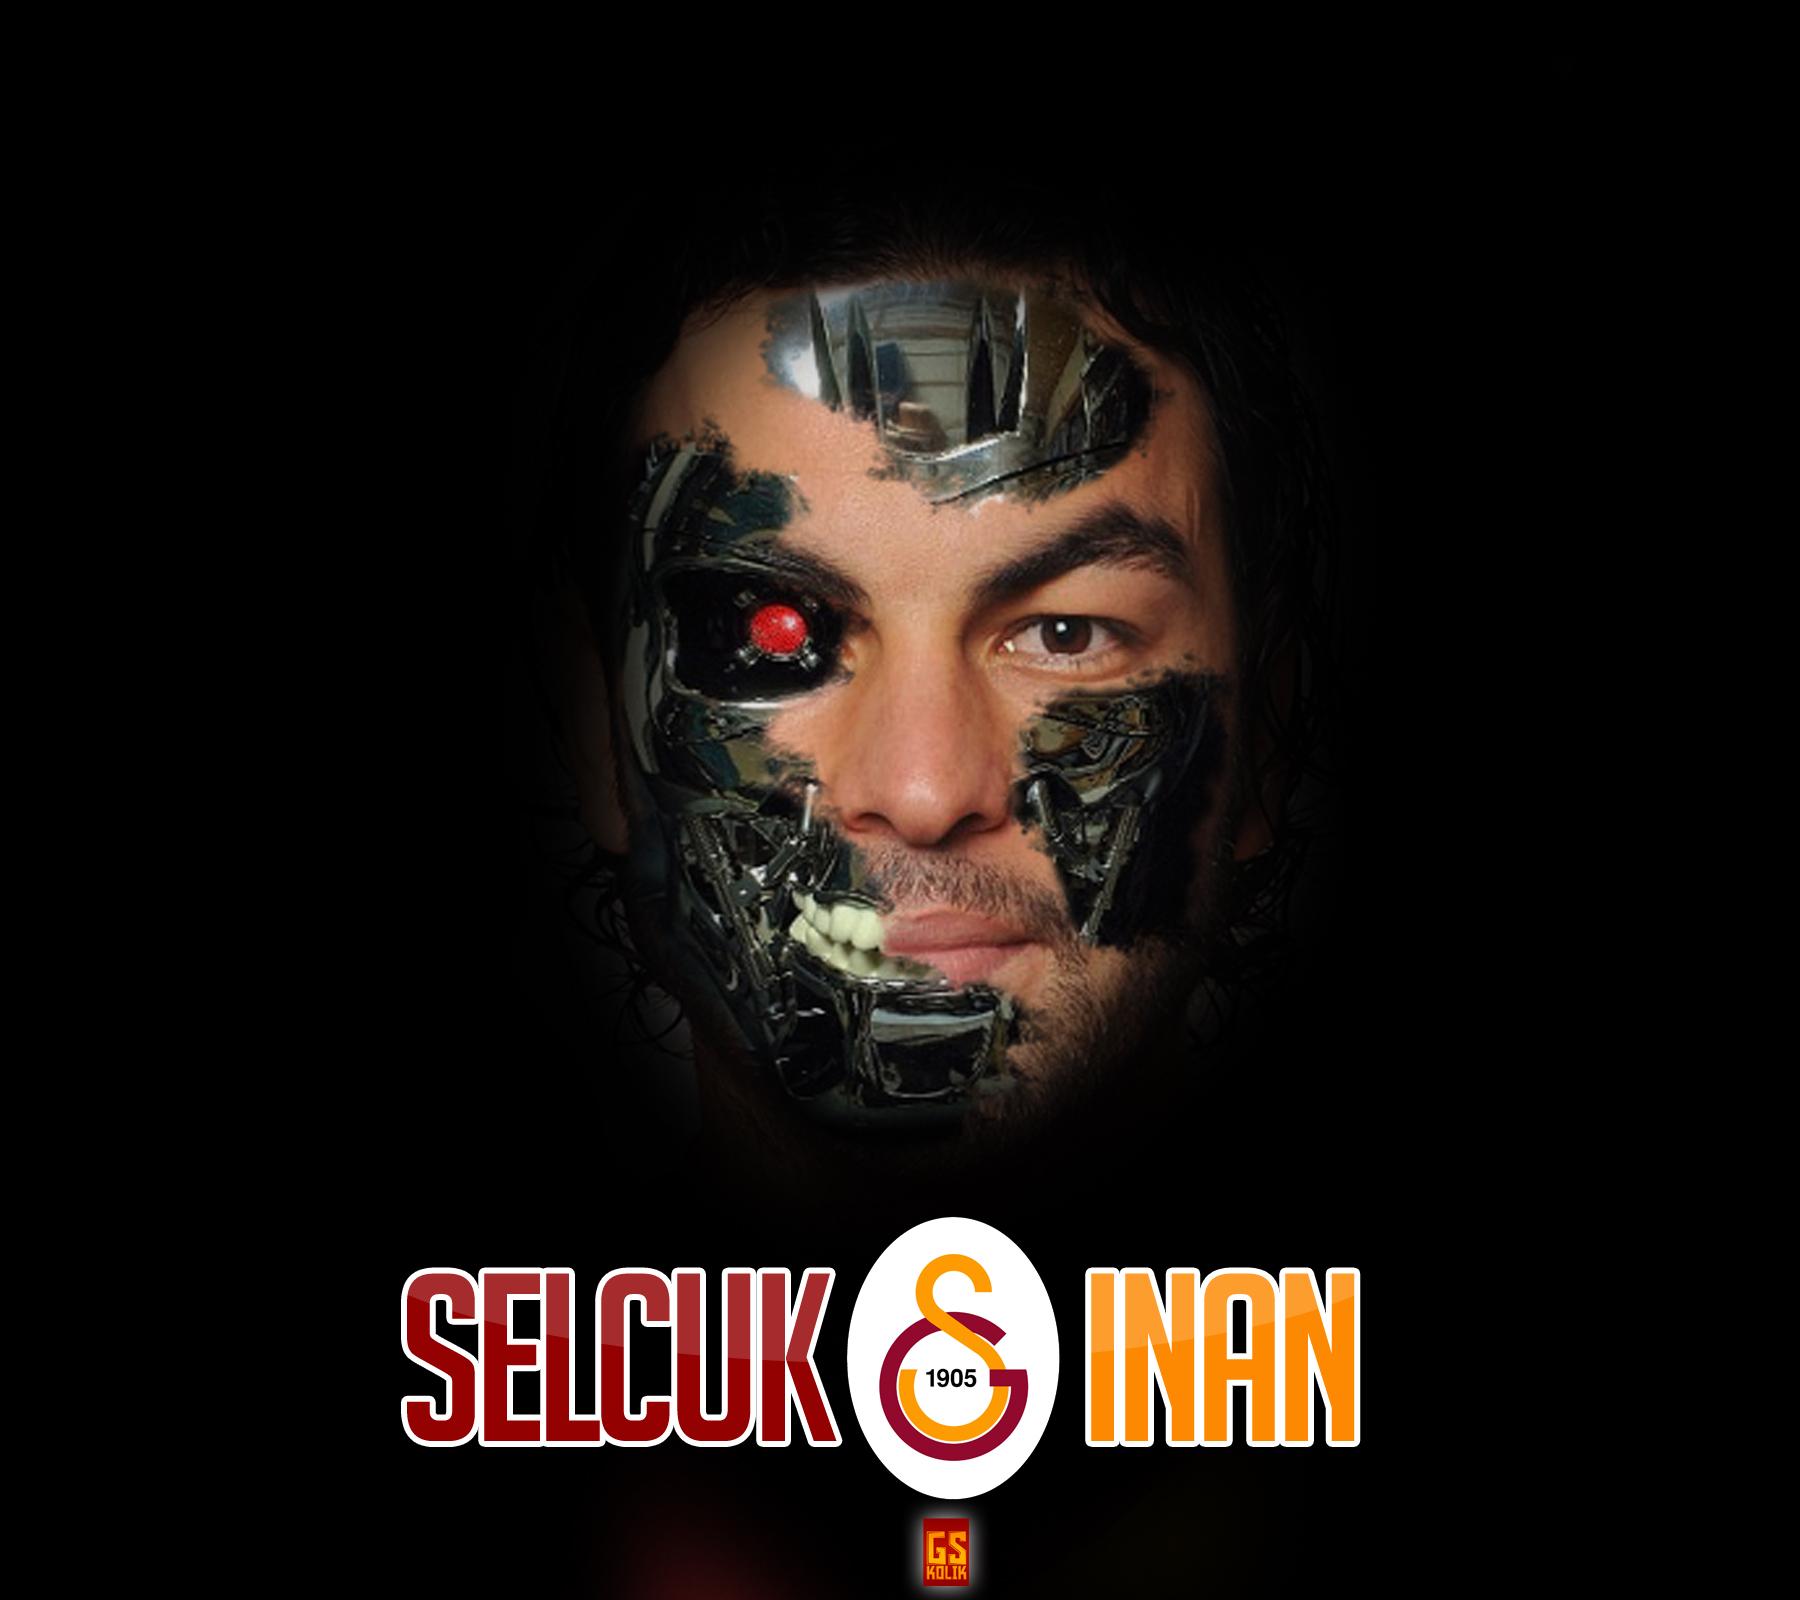 http://fc08.deviantart.net/fs71/f/2012/041/0/b/selcuk_inan_by_gskolik-d4p8n6t.jpg